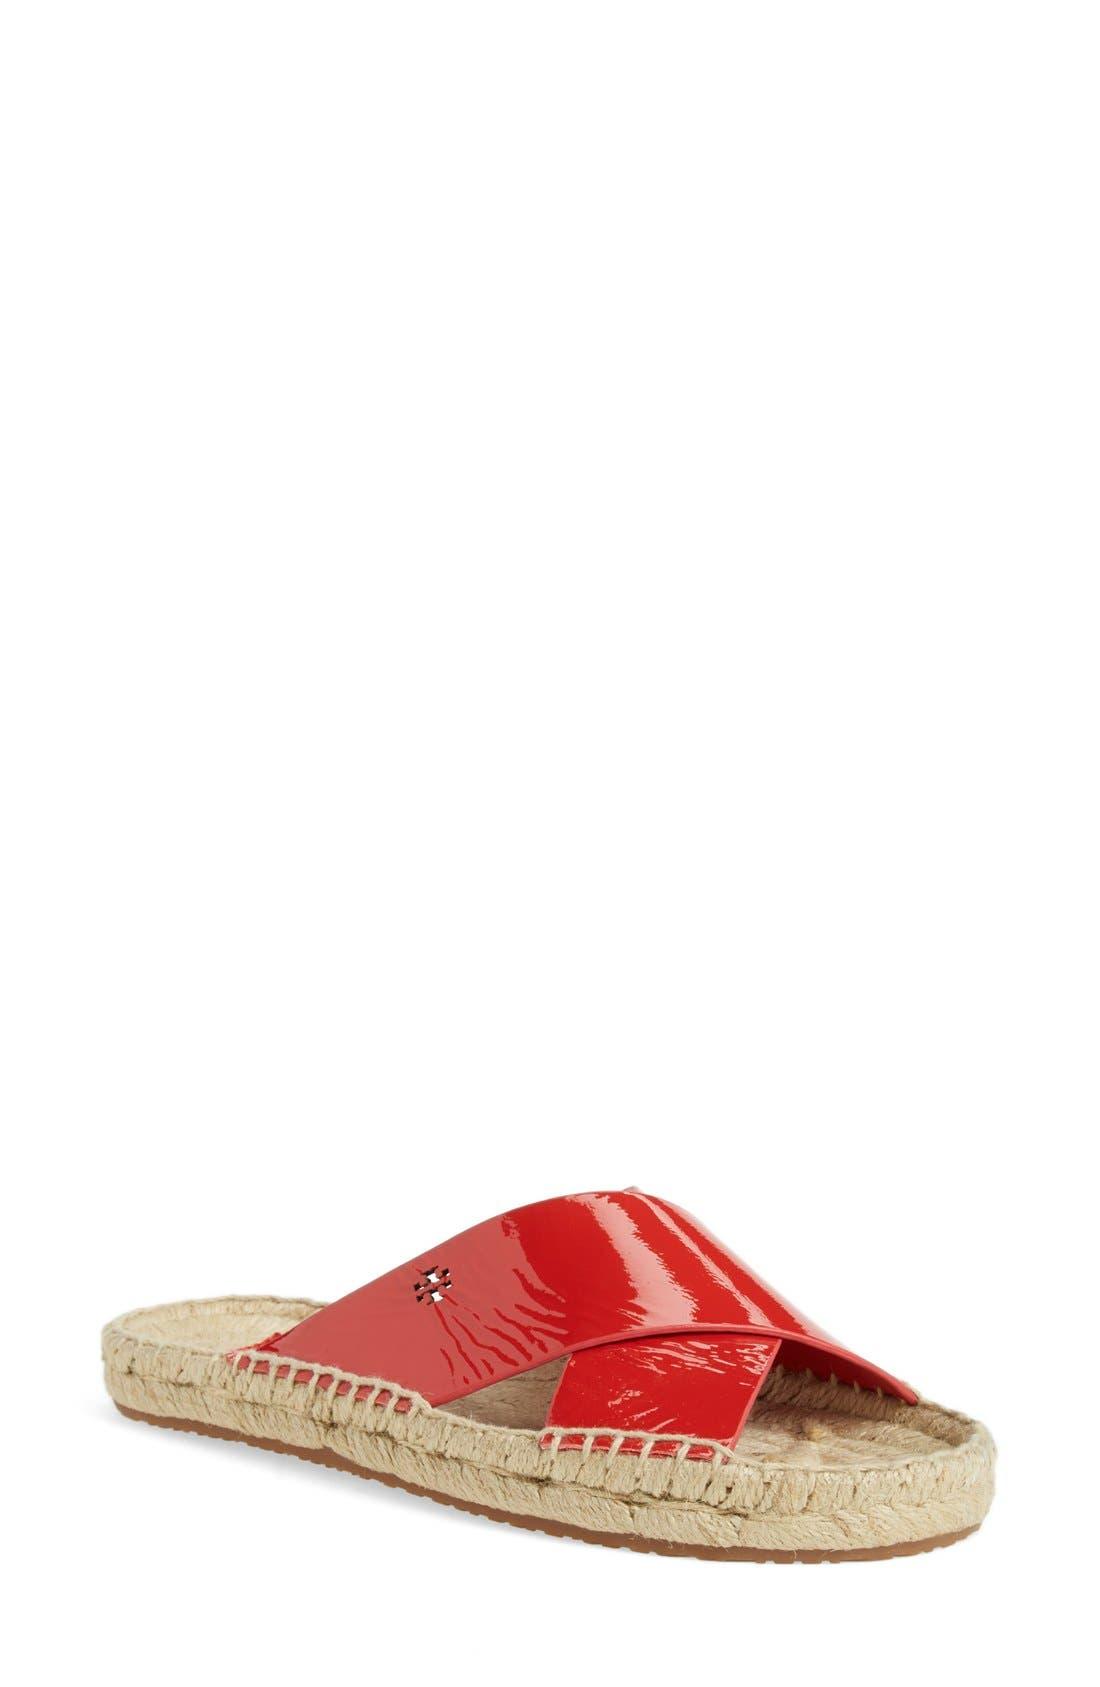 TORY BURCH 'Bima' Espadrille Slide Sandal, Main, color, 601